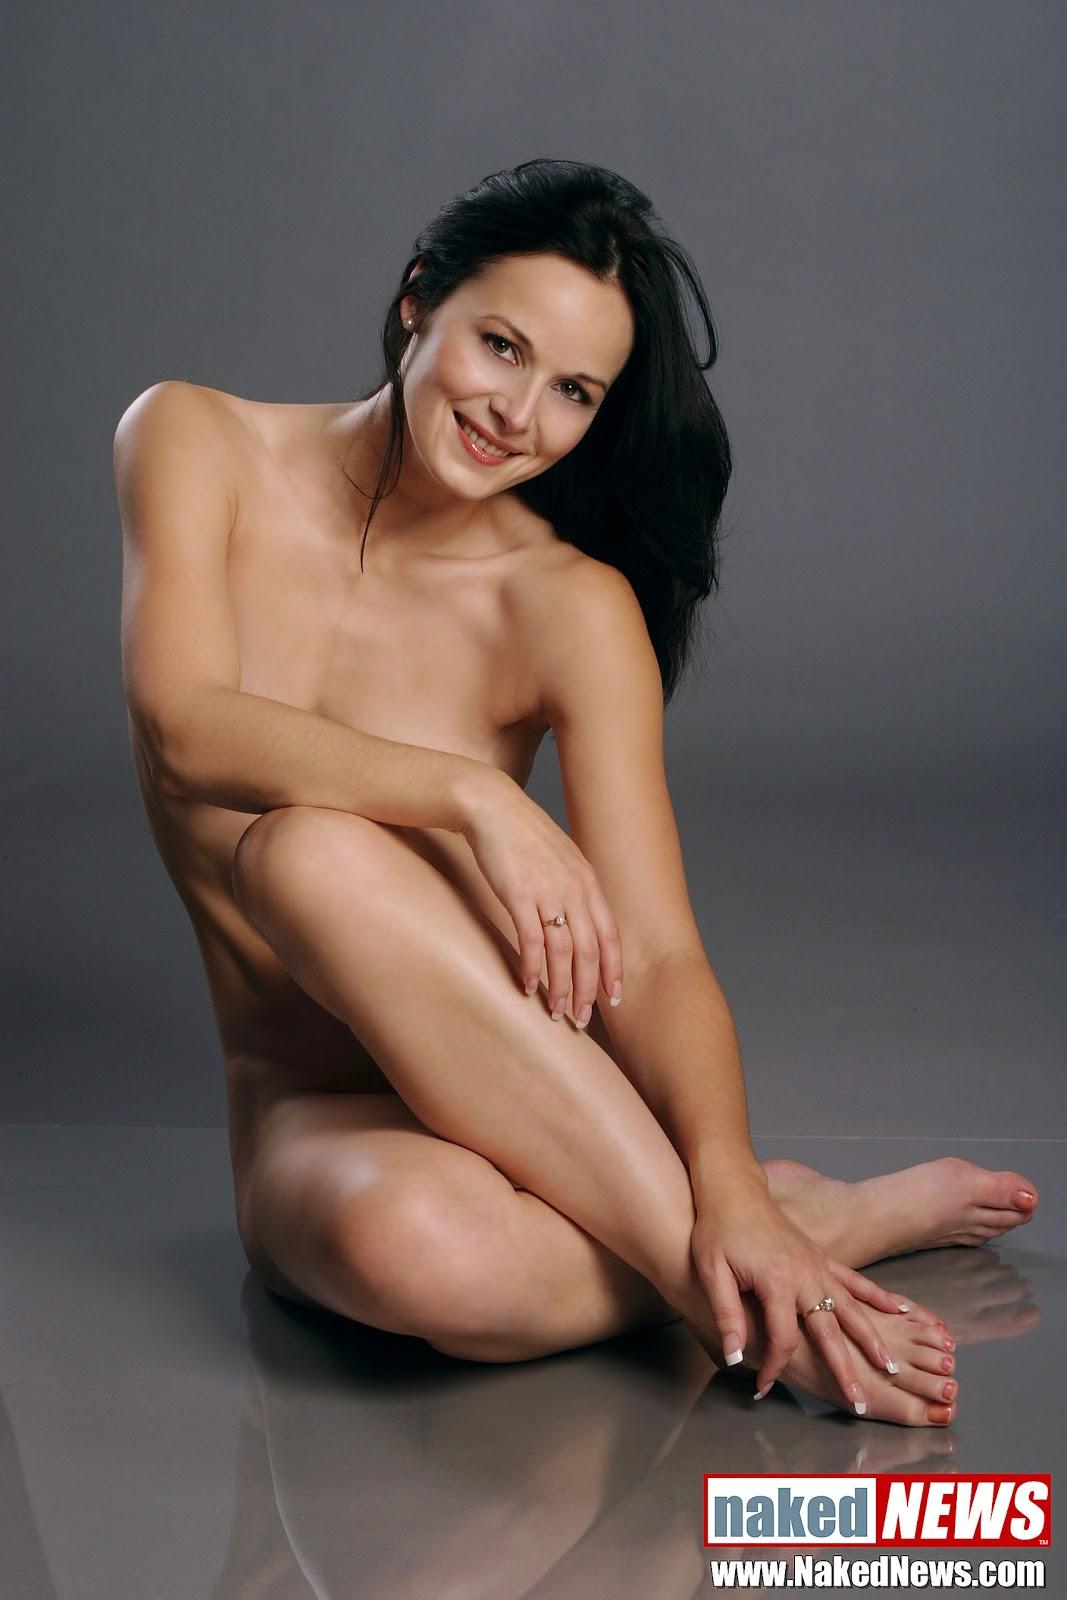 nude women bbw picture fat